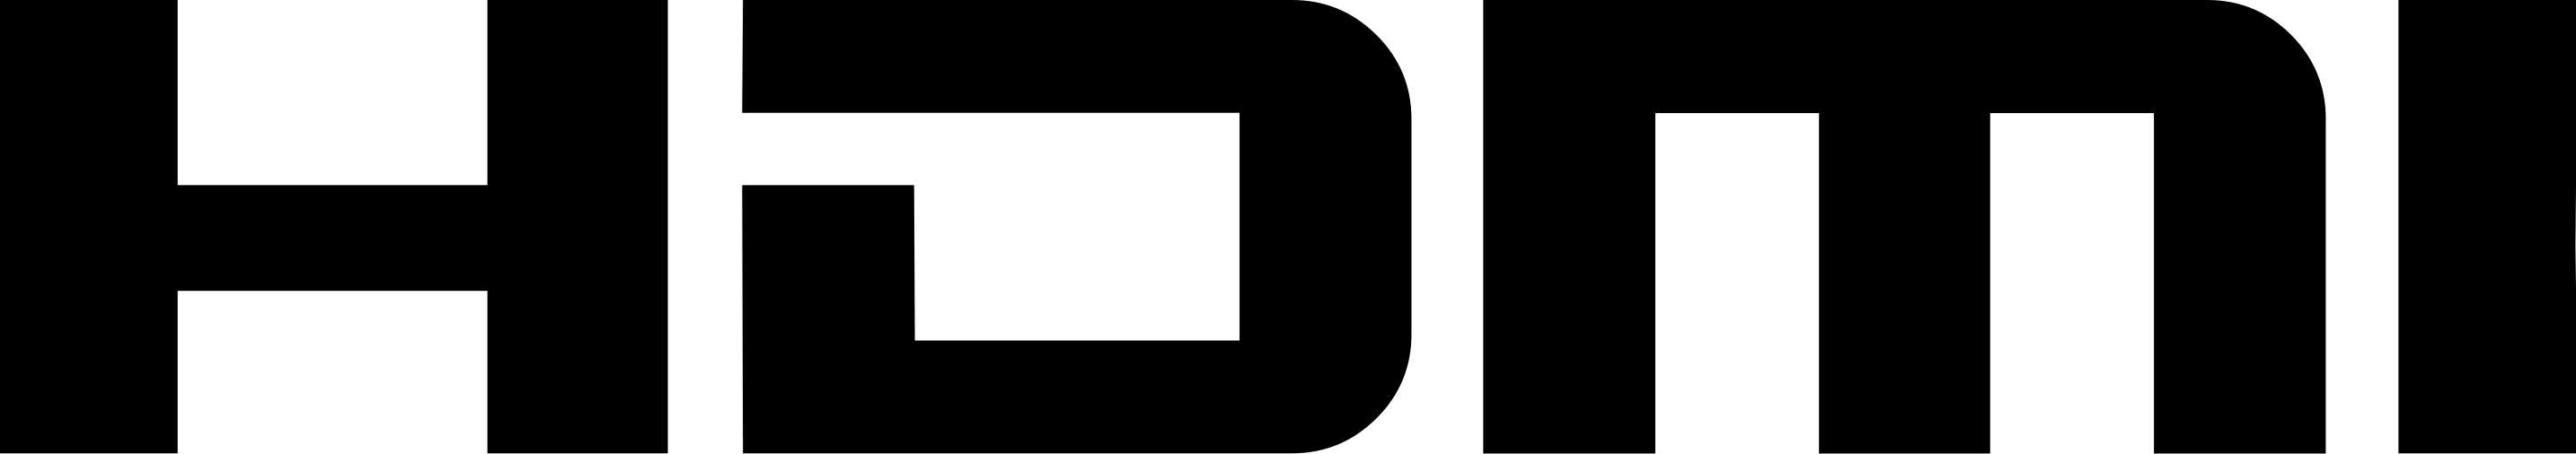 hdmi logo 3 - HDMI Logo